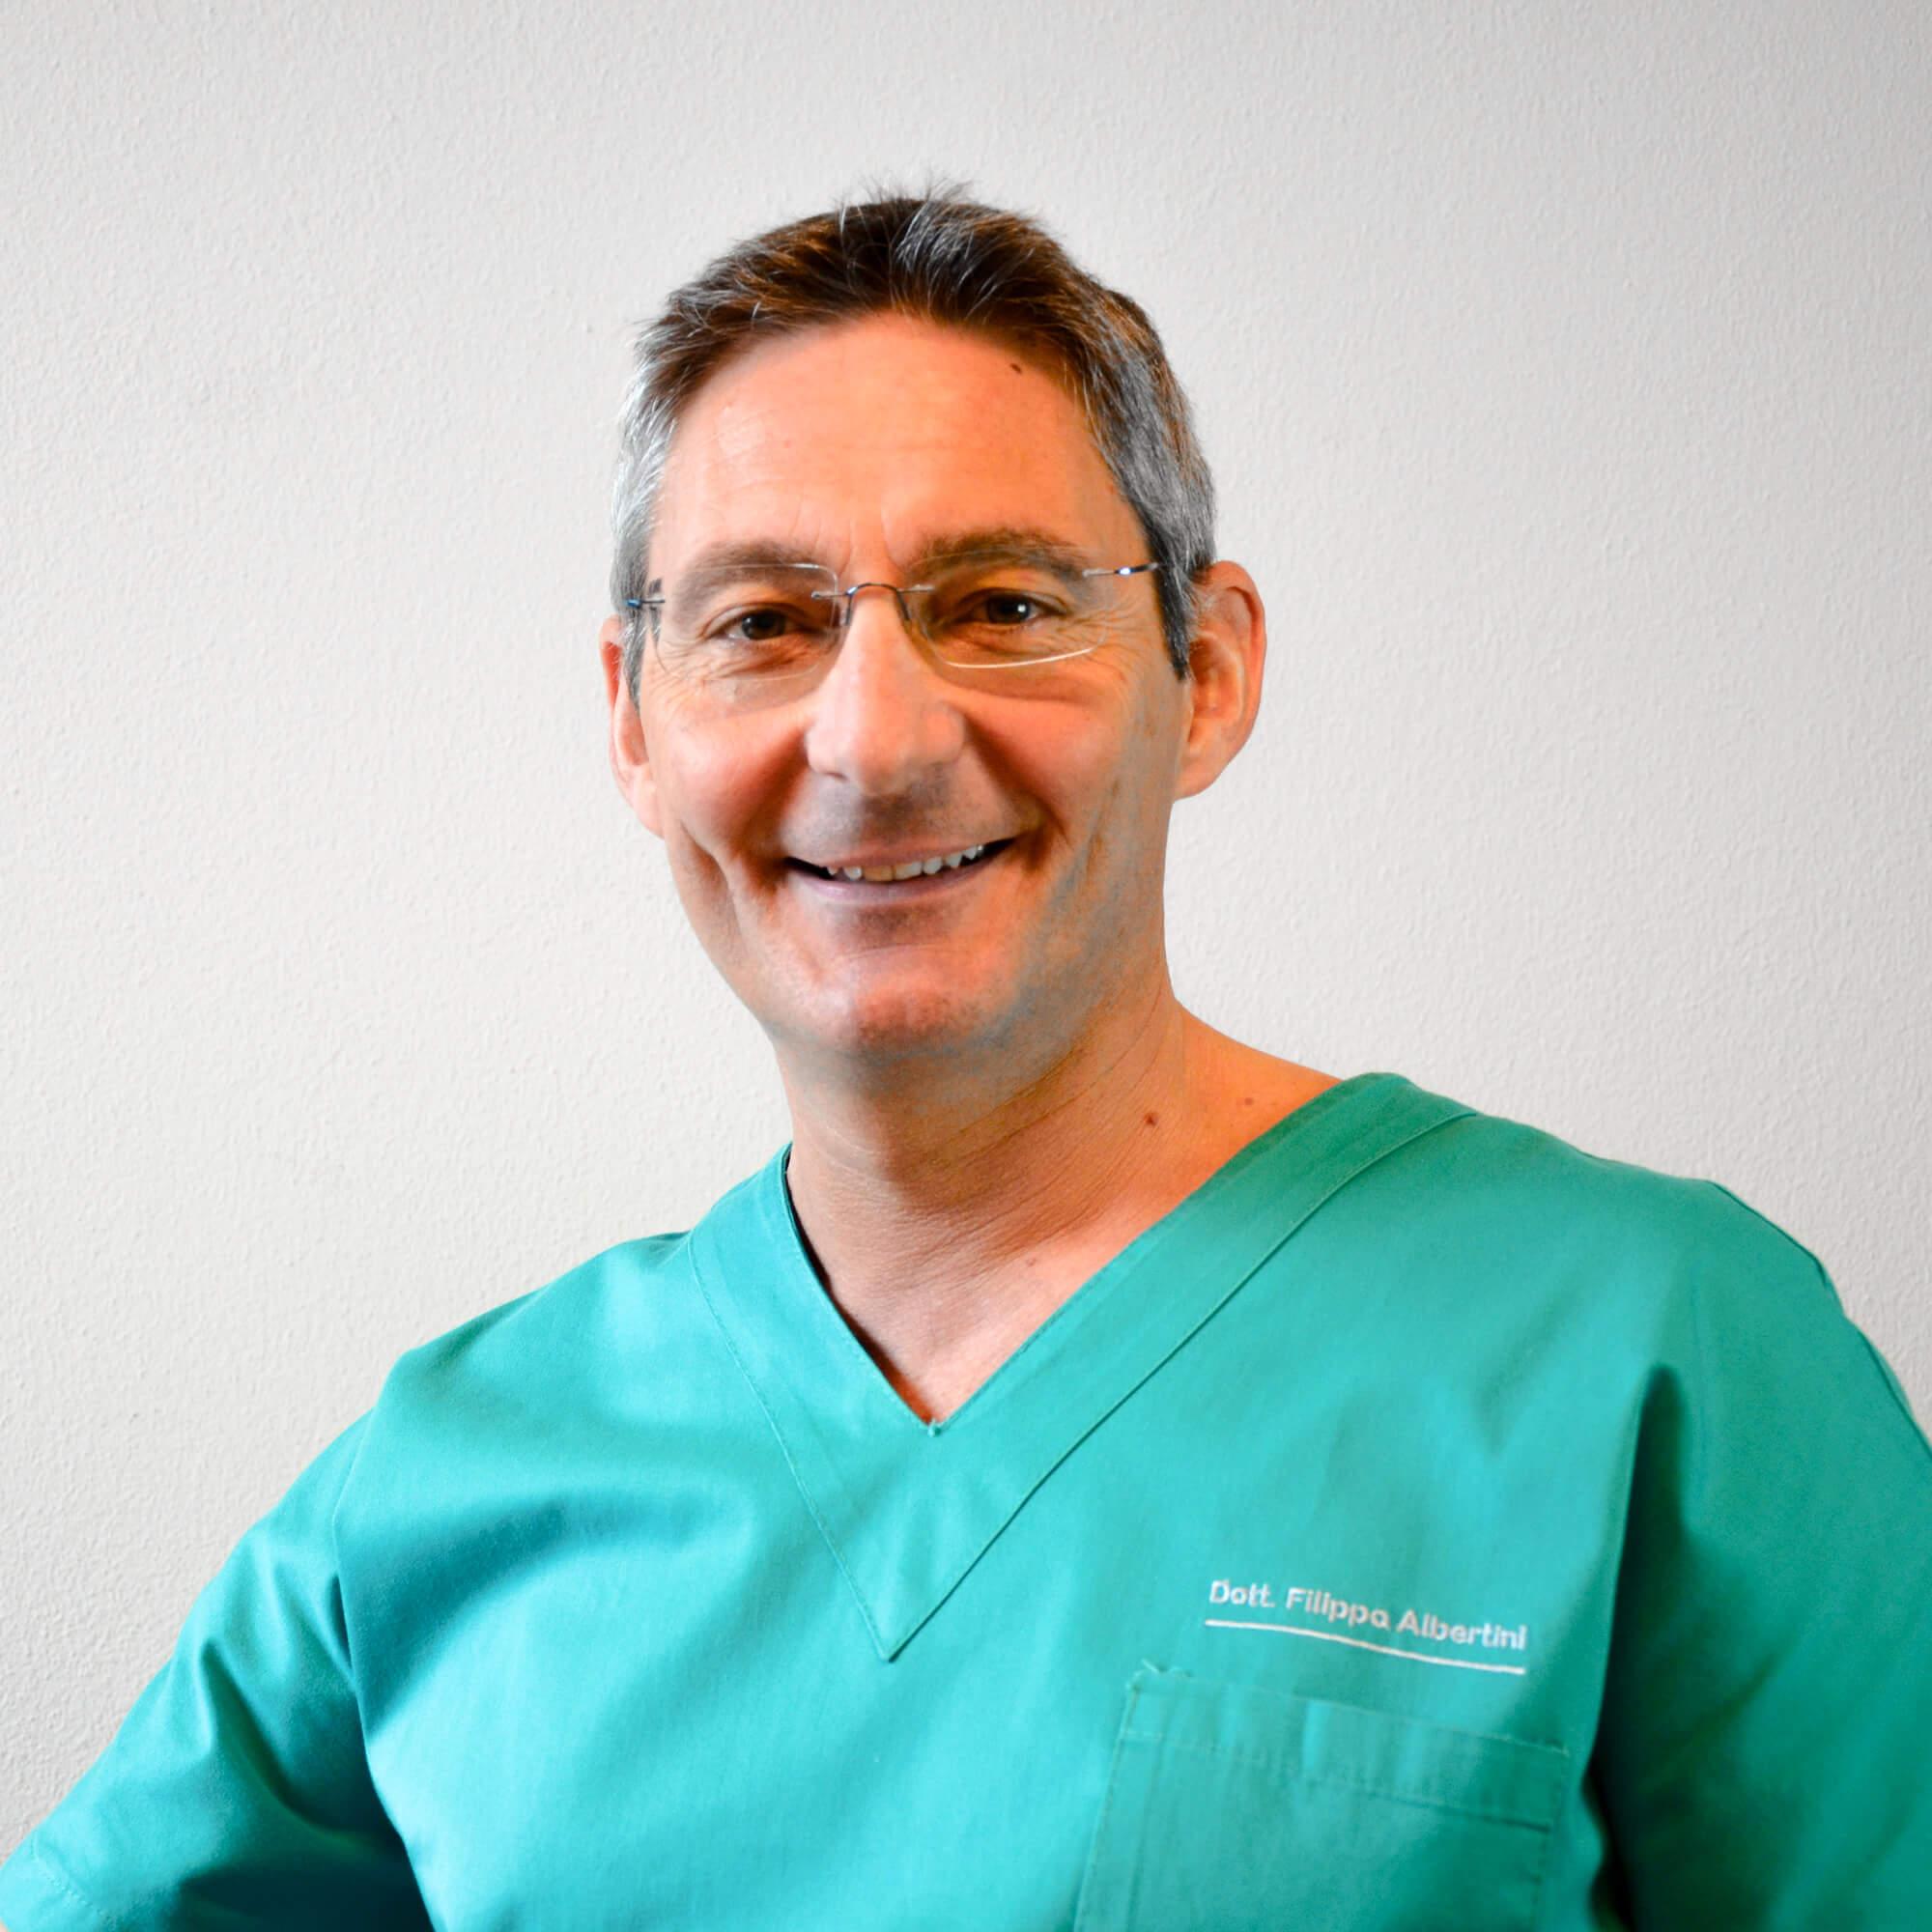 Dott. Filippo Albertini